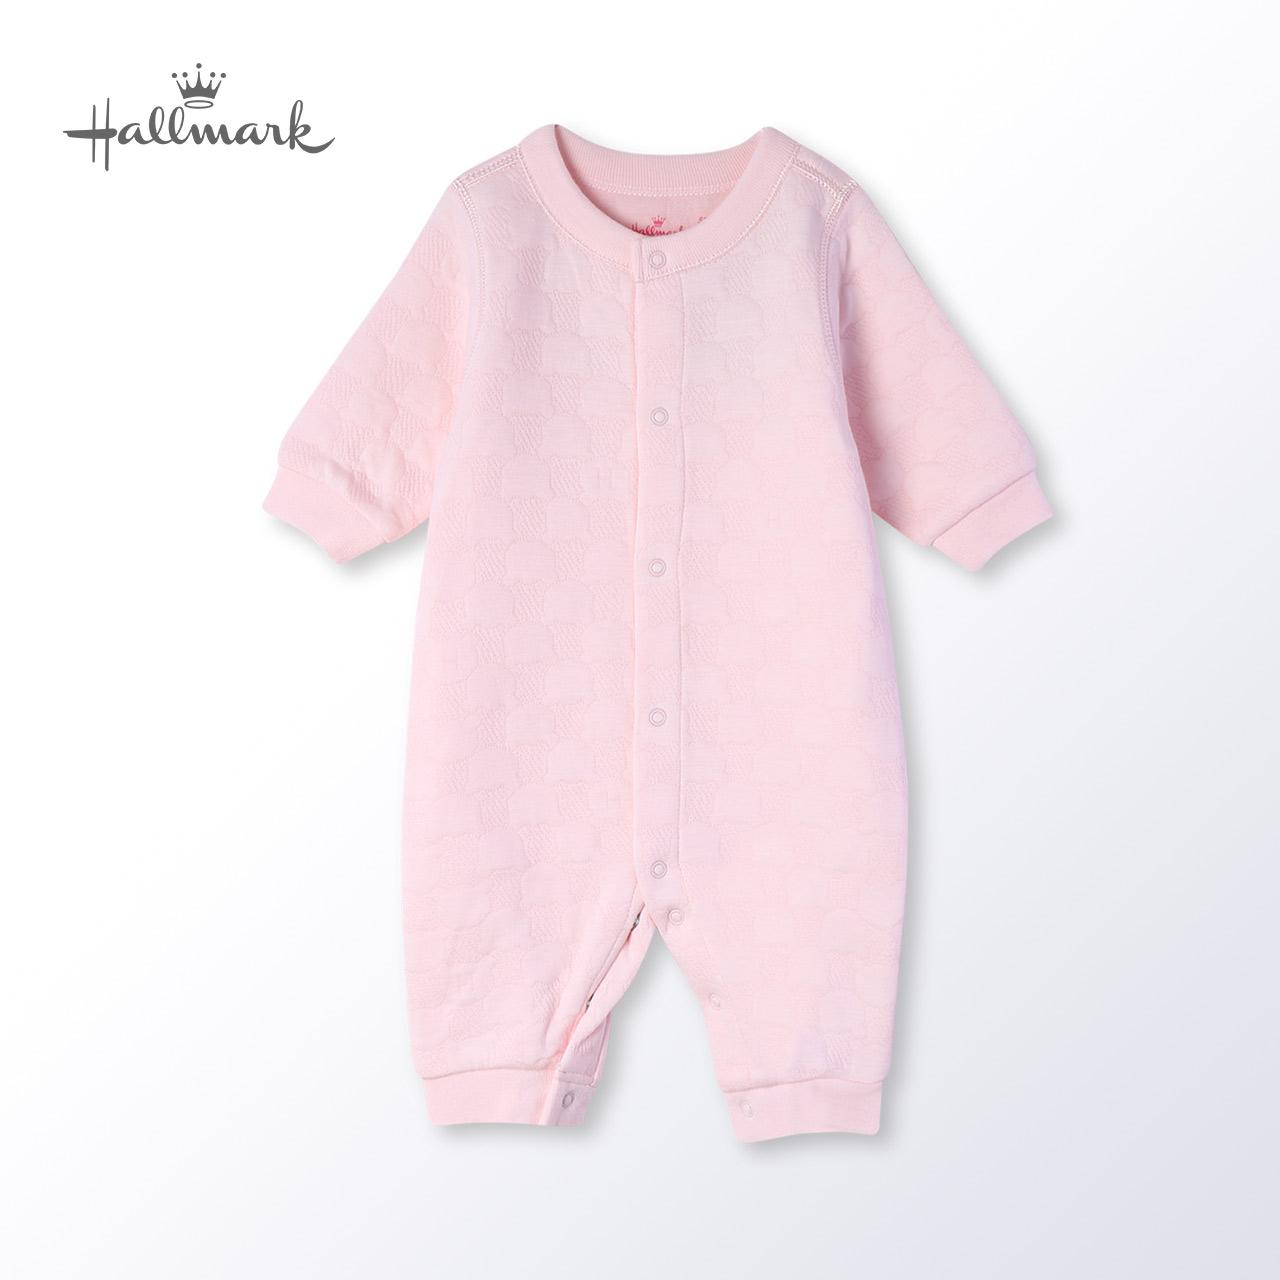 Hallmark贺曼冬季女婴儿服夹棉布保暖连体衣宝宝连体睡衣家居爬服